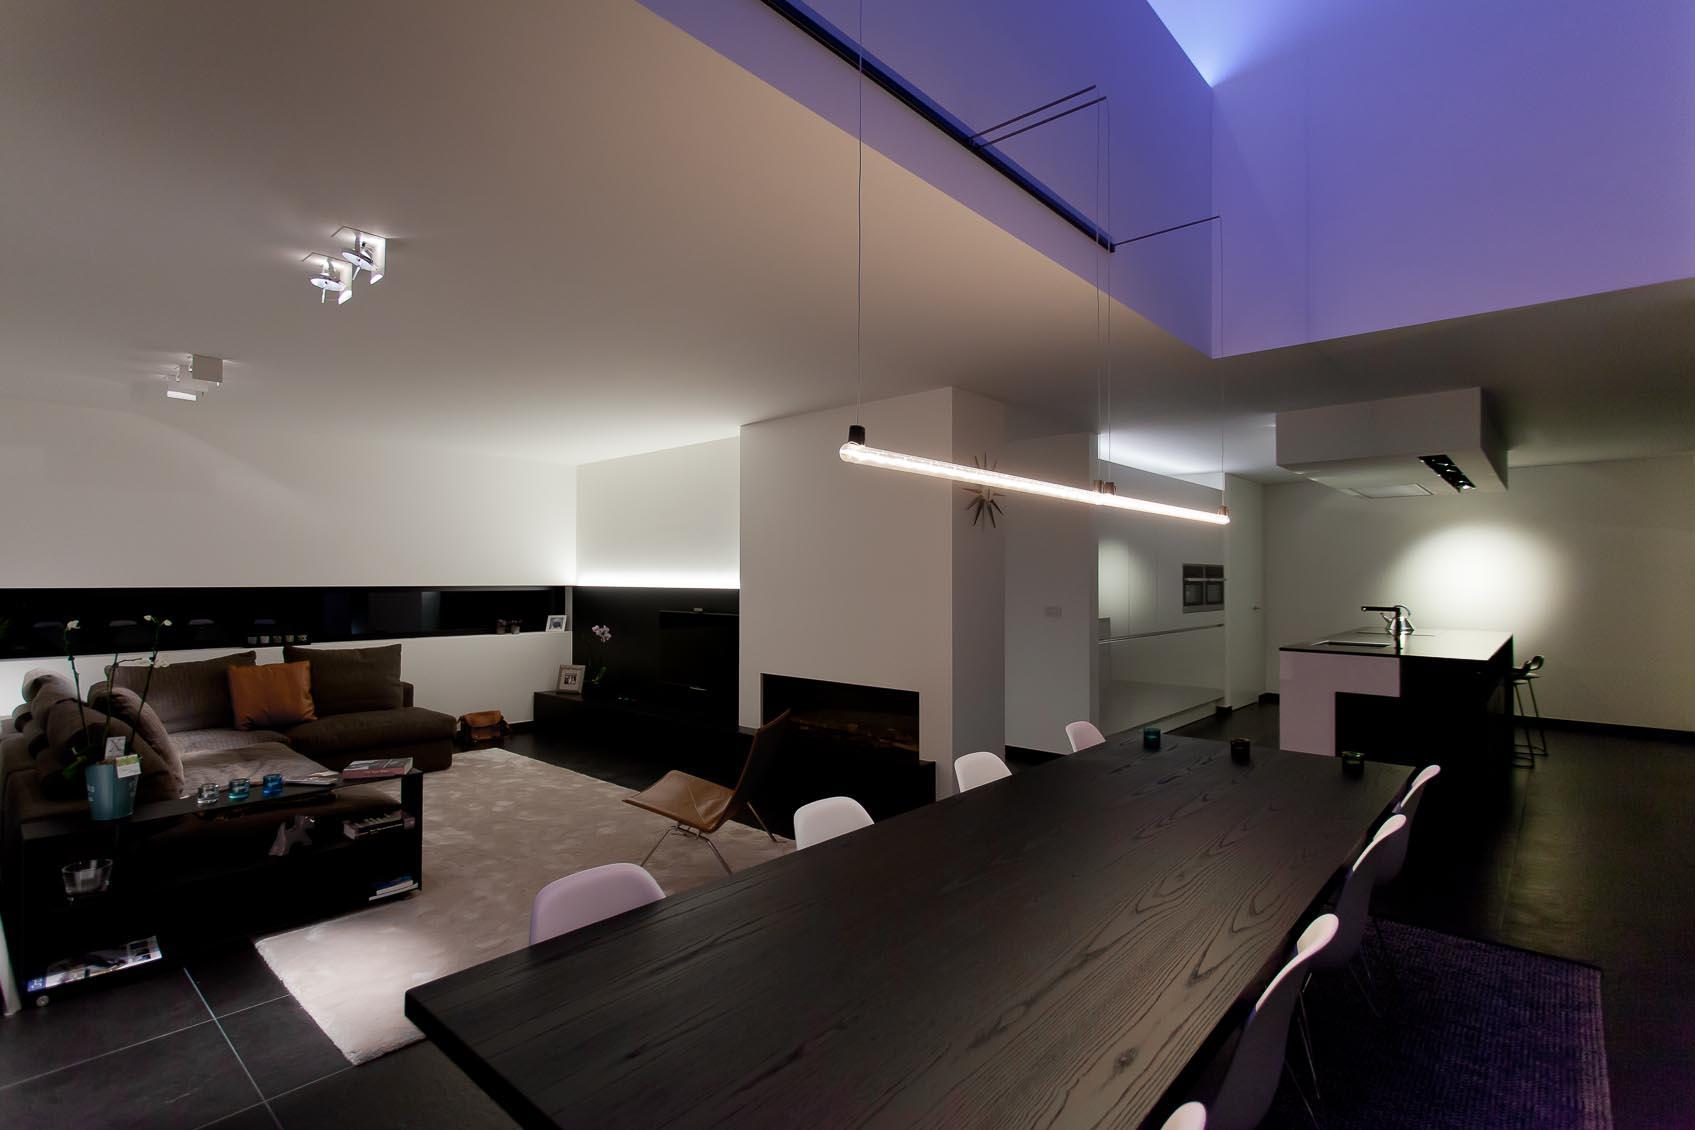 Stunning Led Verlichting Eetkamer Contemporary - New Home Design ...